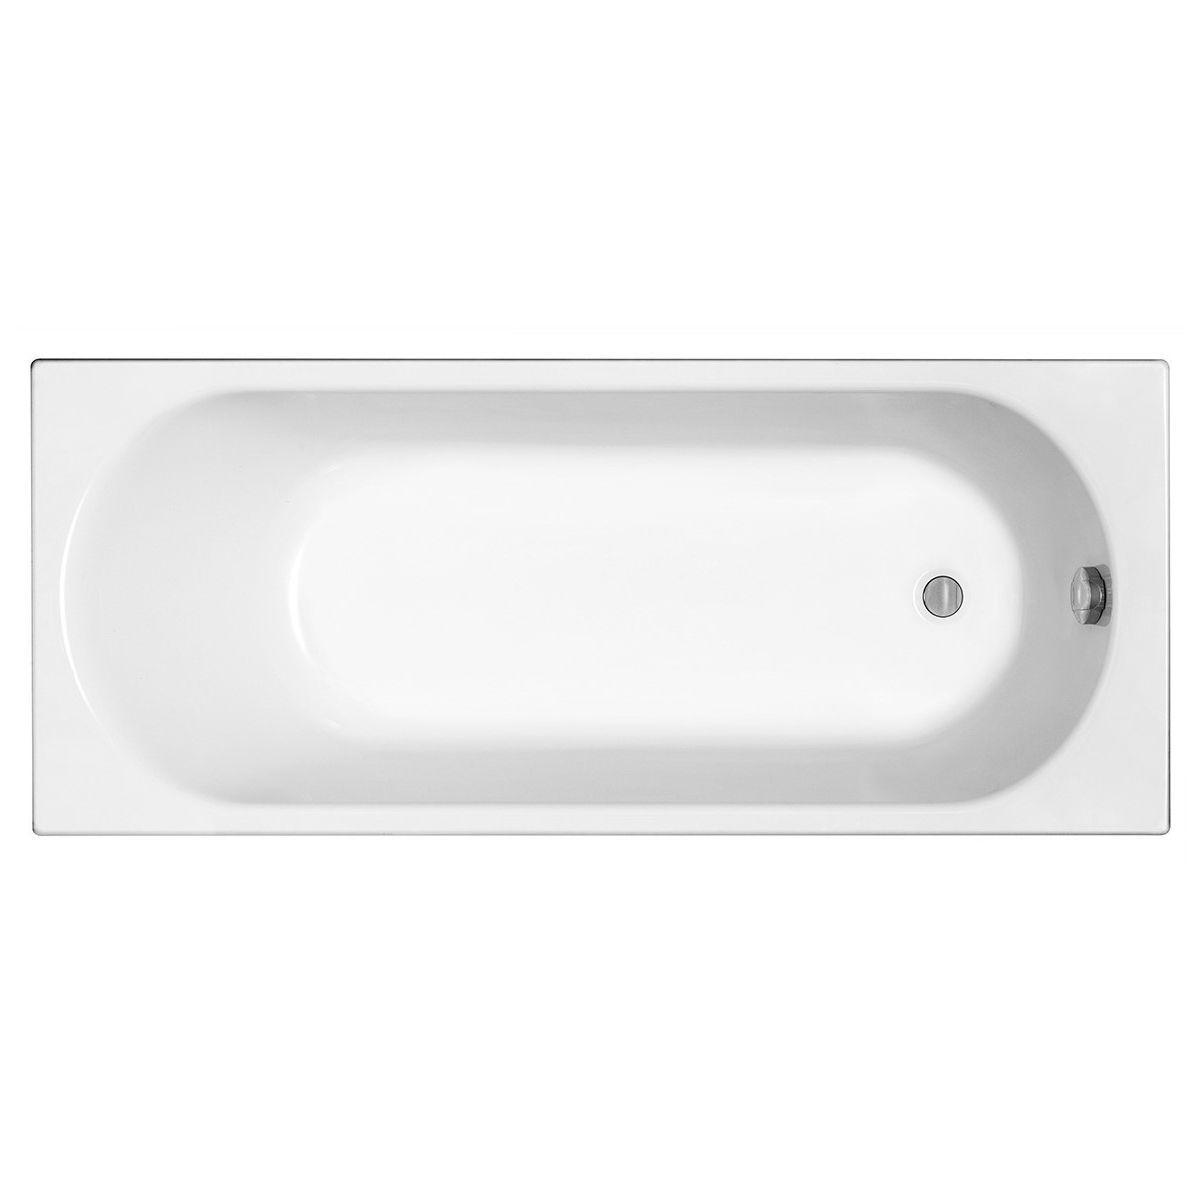 Ванна KOLO OPAL PLUS 150x70 см прямоугольная, без ножек